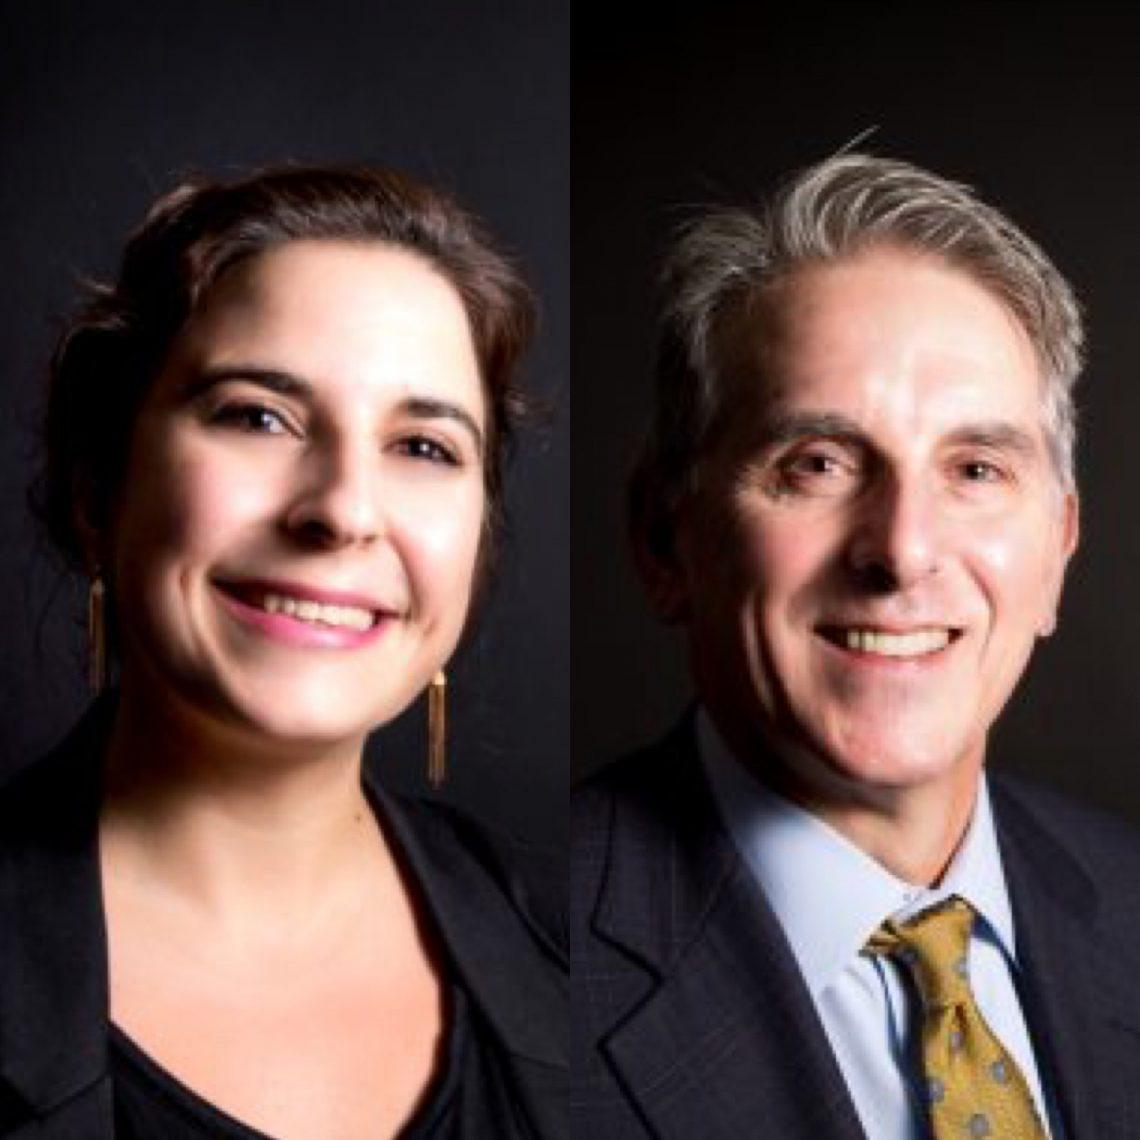 Dr. Alexandra Benavente-Perez and Dr. David Troilo